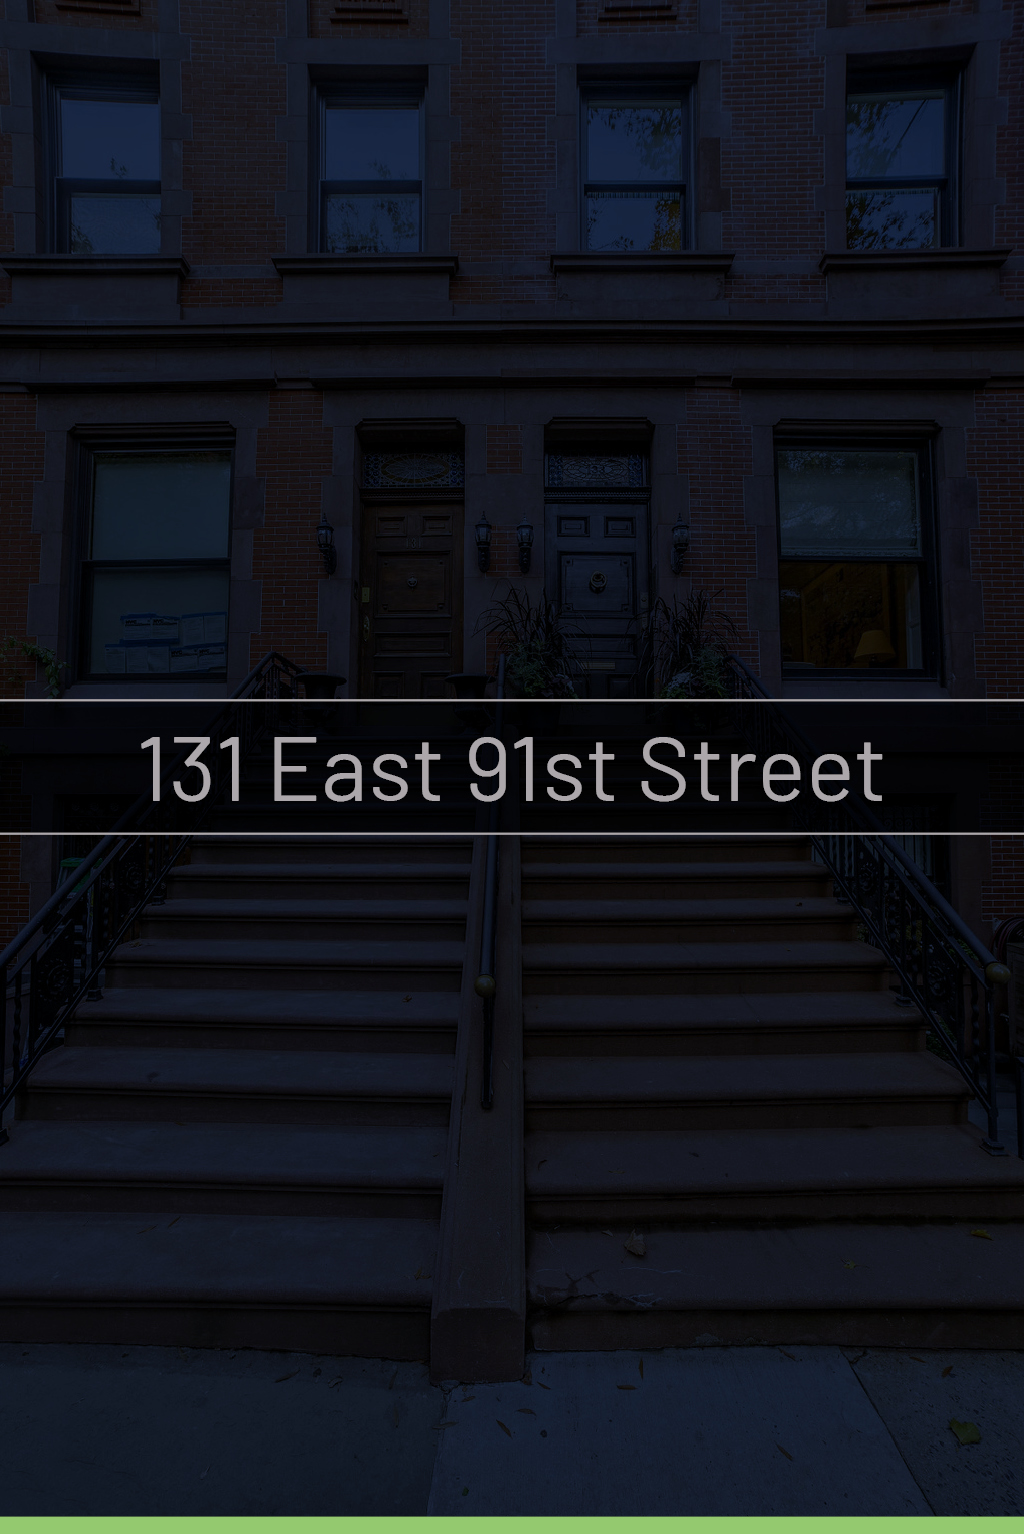 131East91stStreet(house)